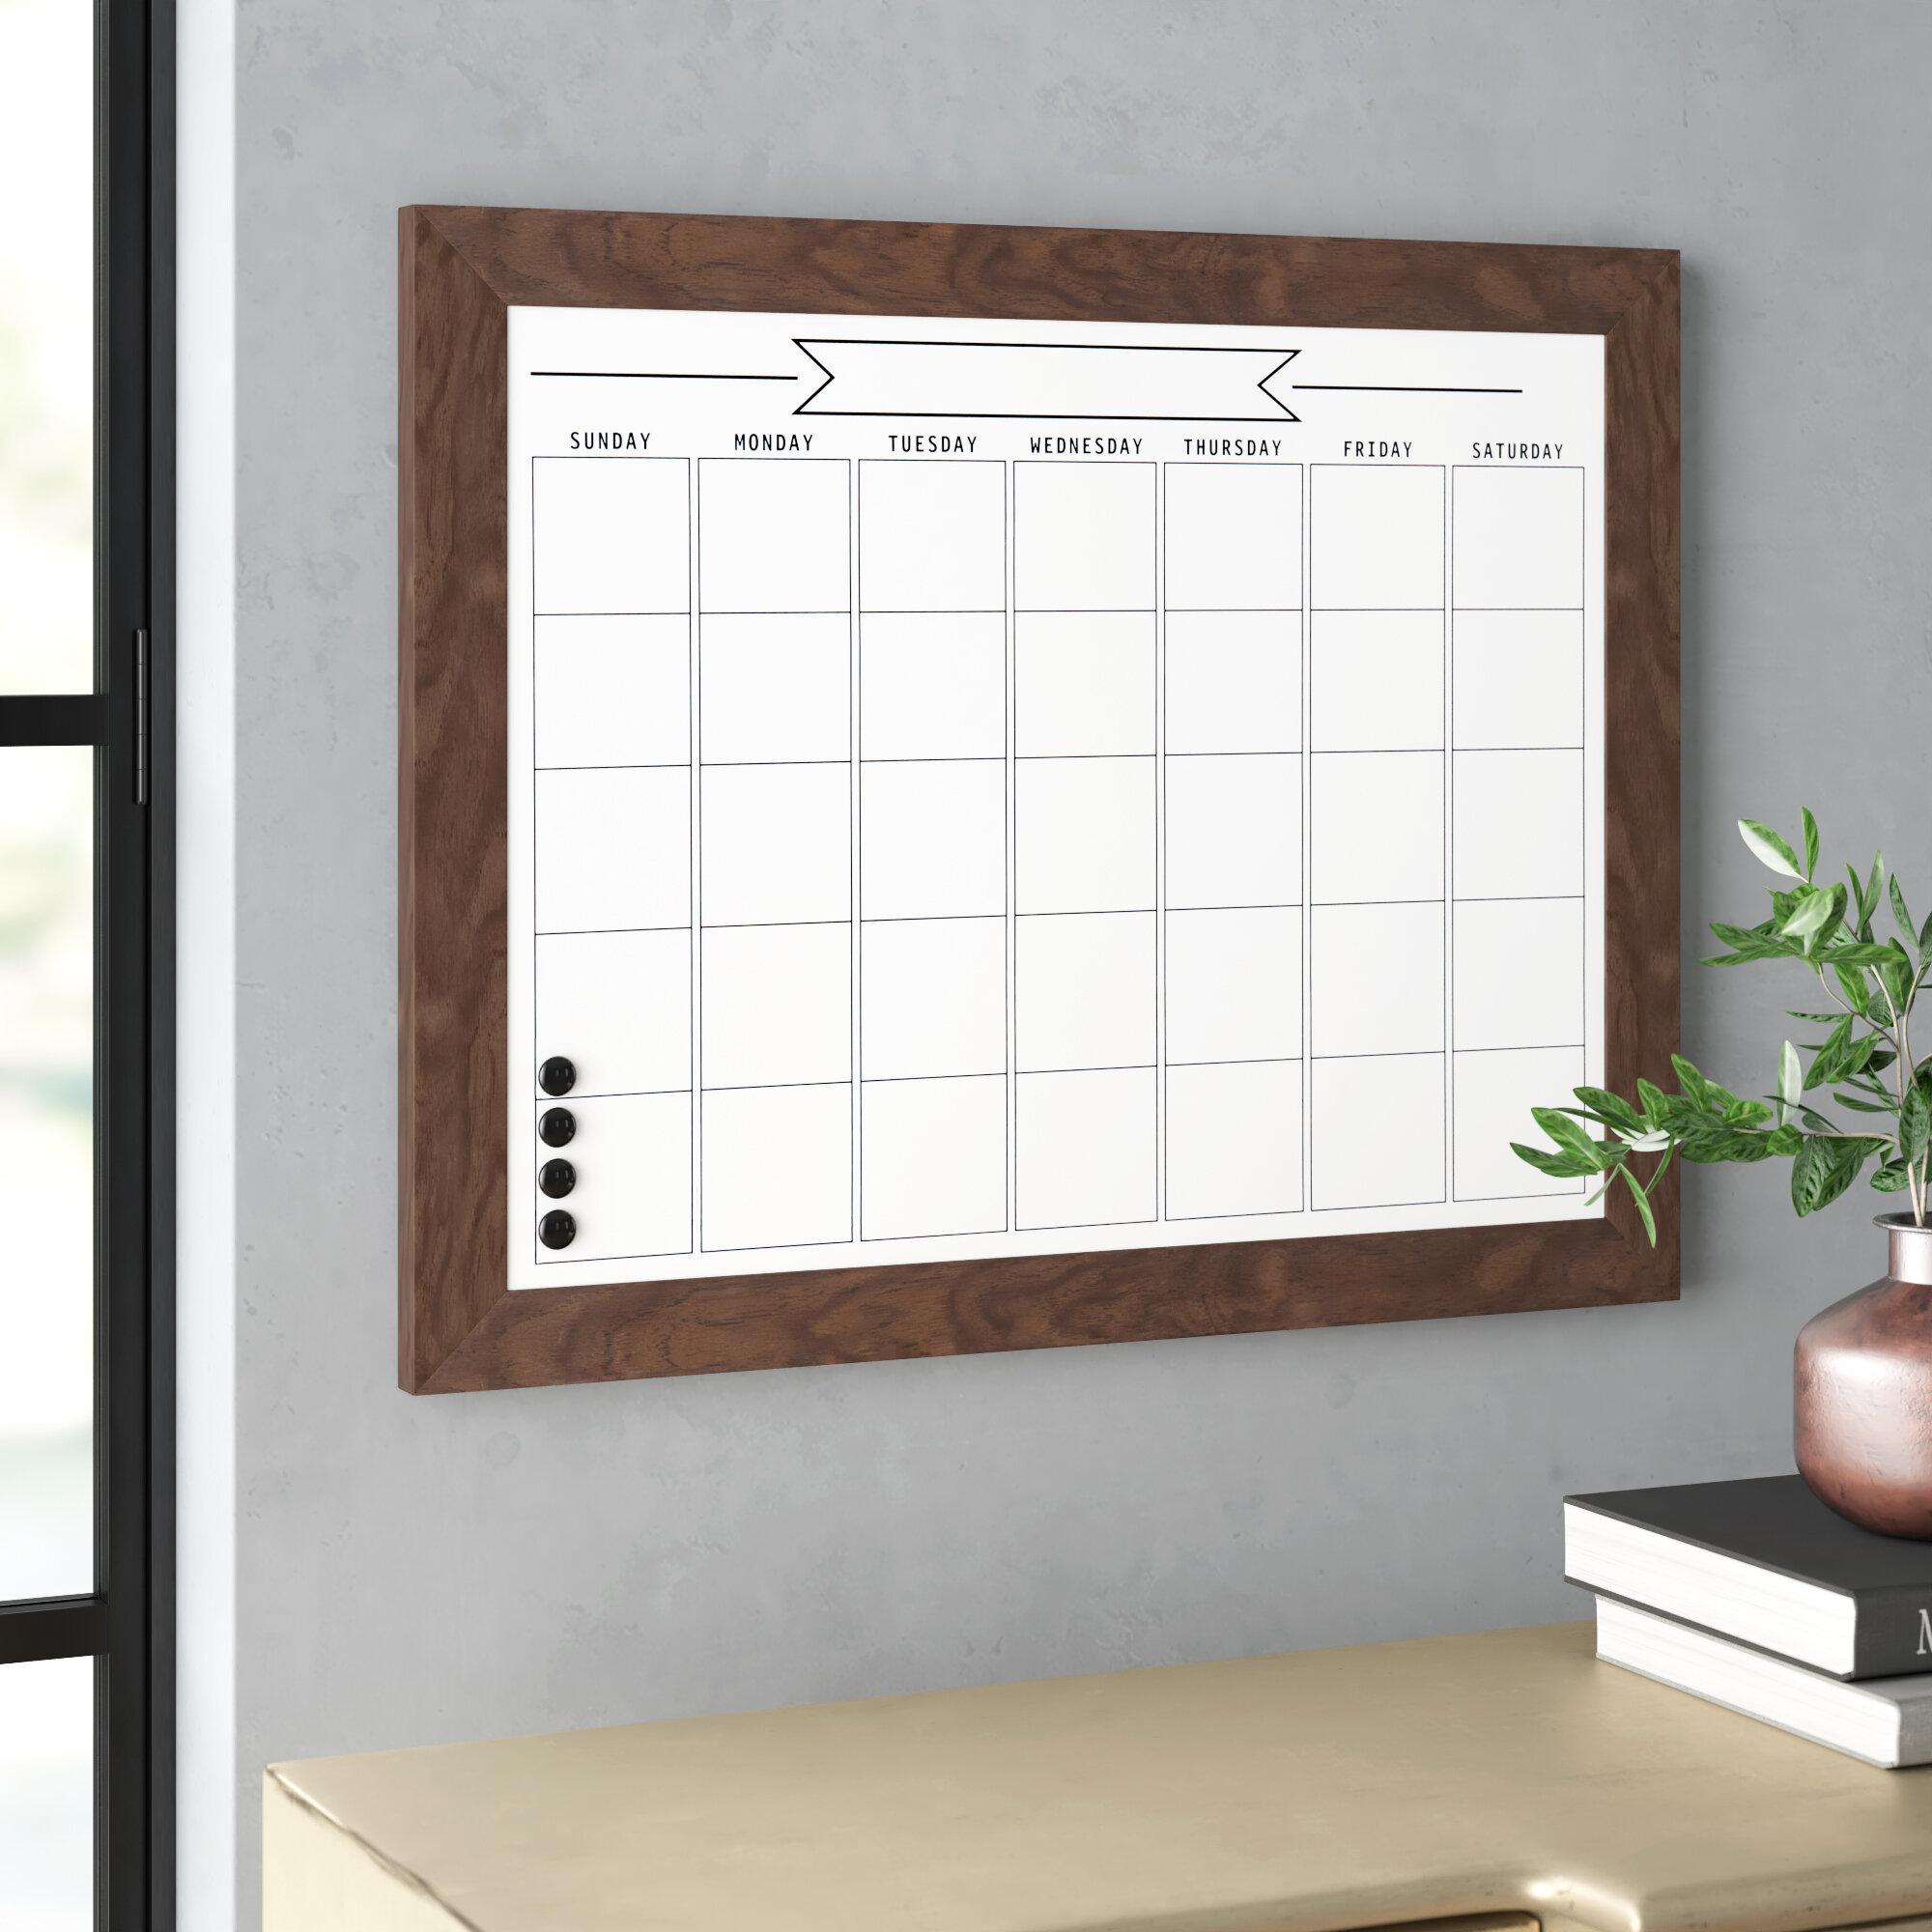 Calendar Dry Erase Memo Boards You Ll Love In 2021 Wayfair